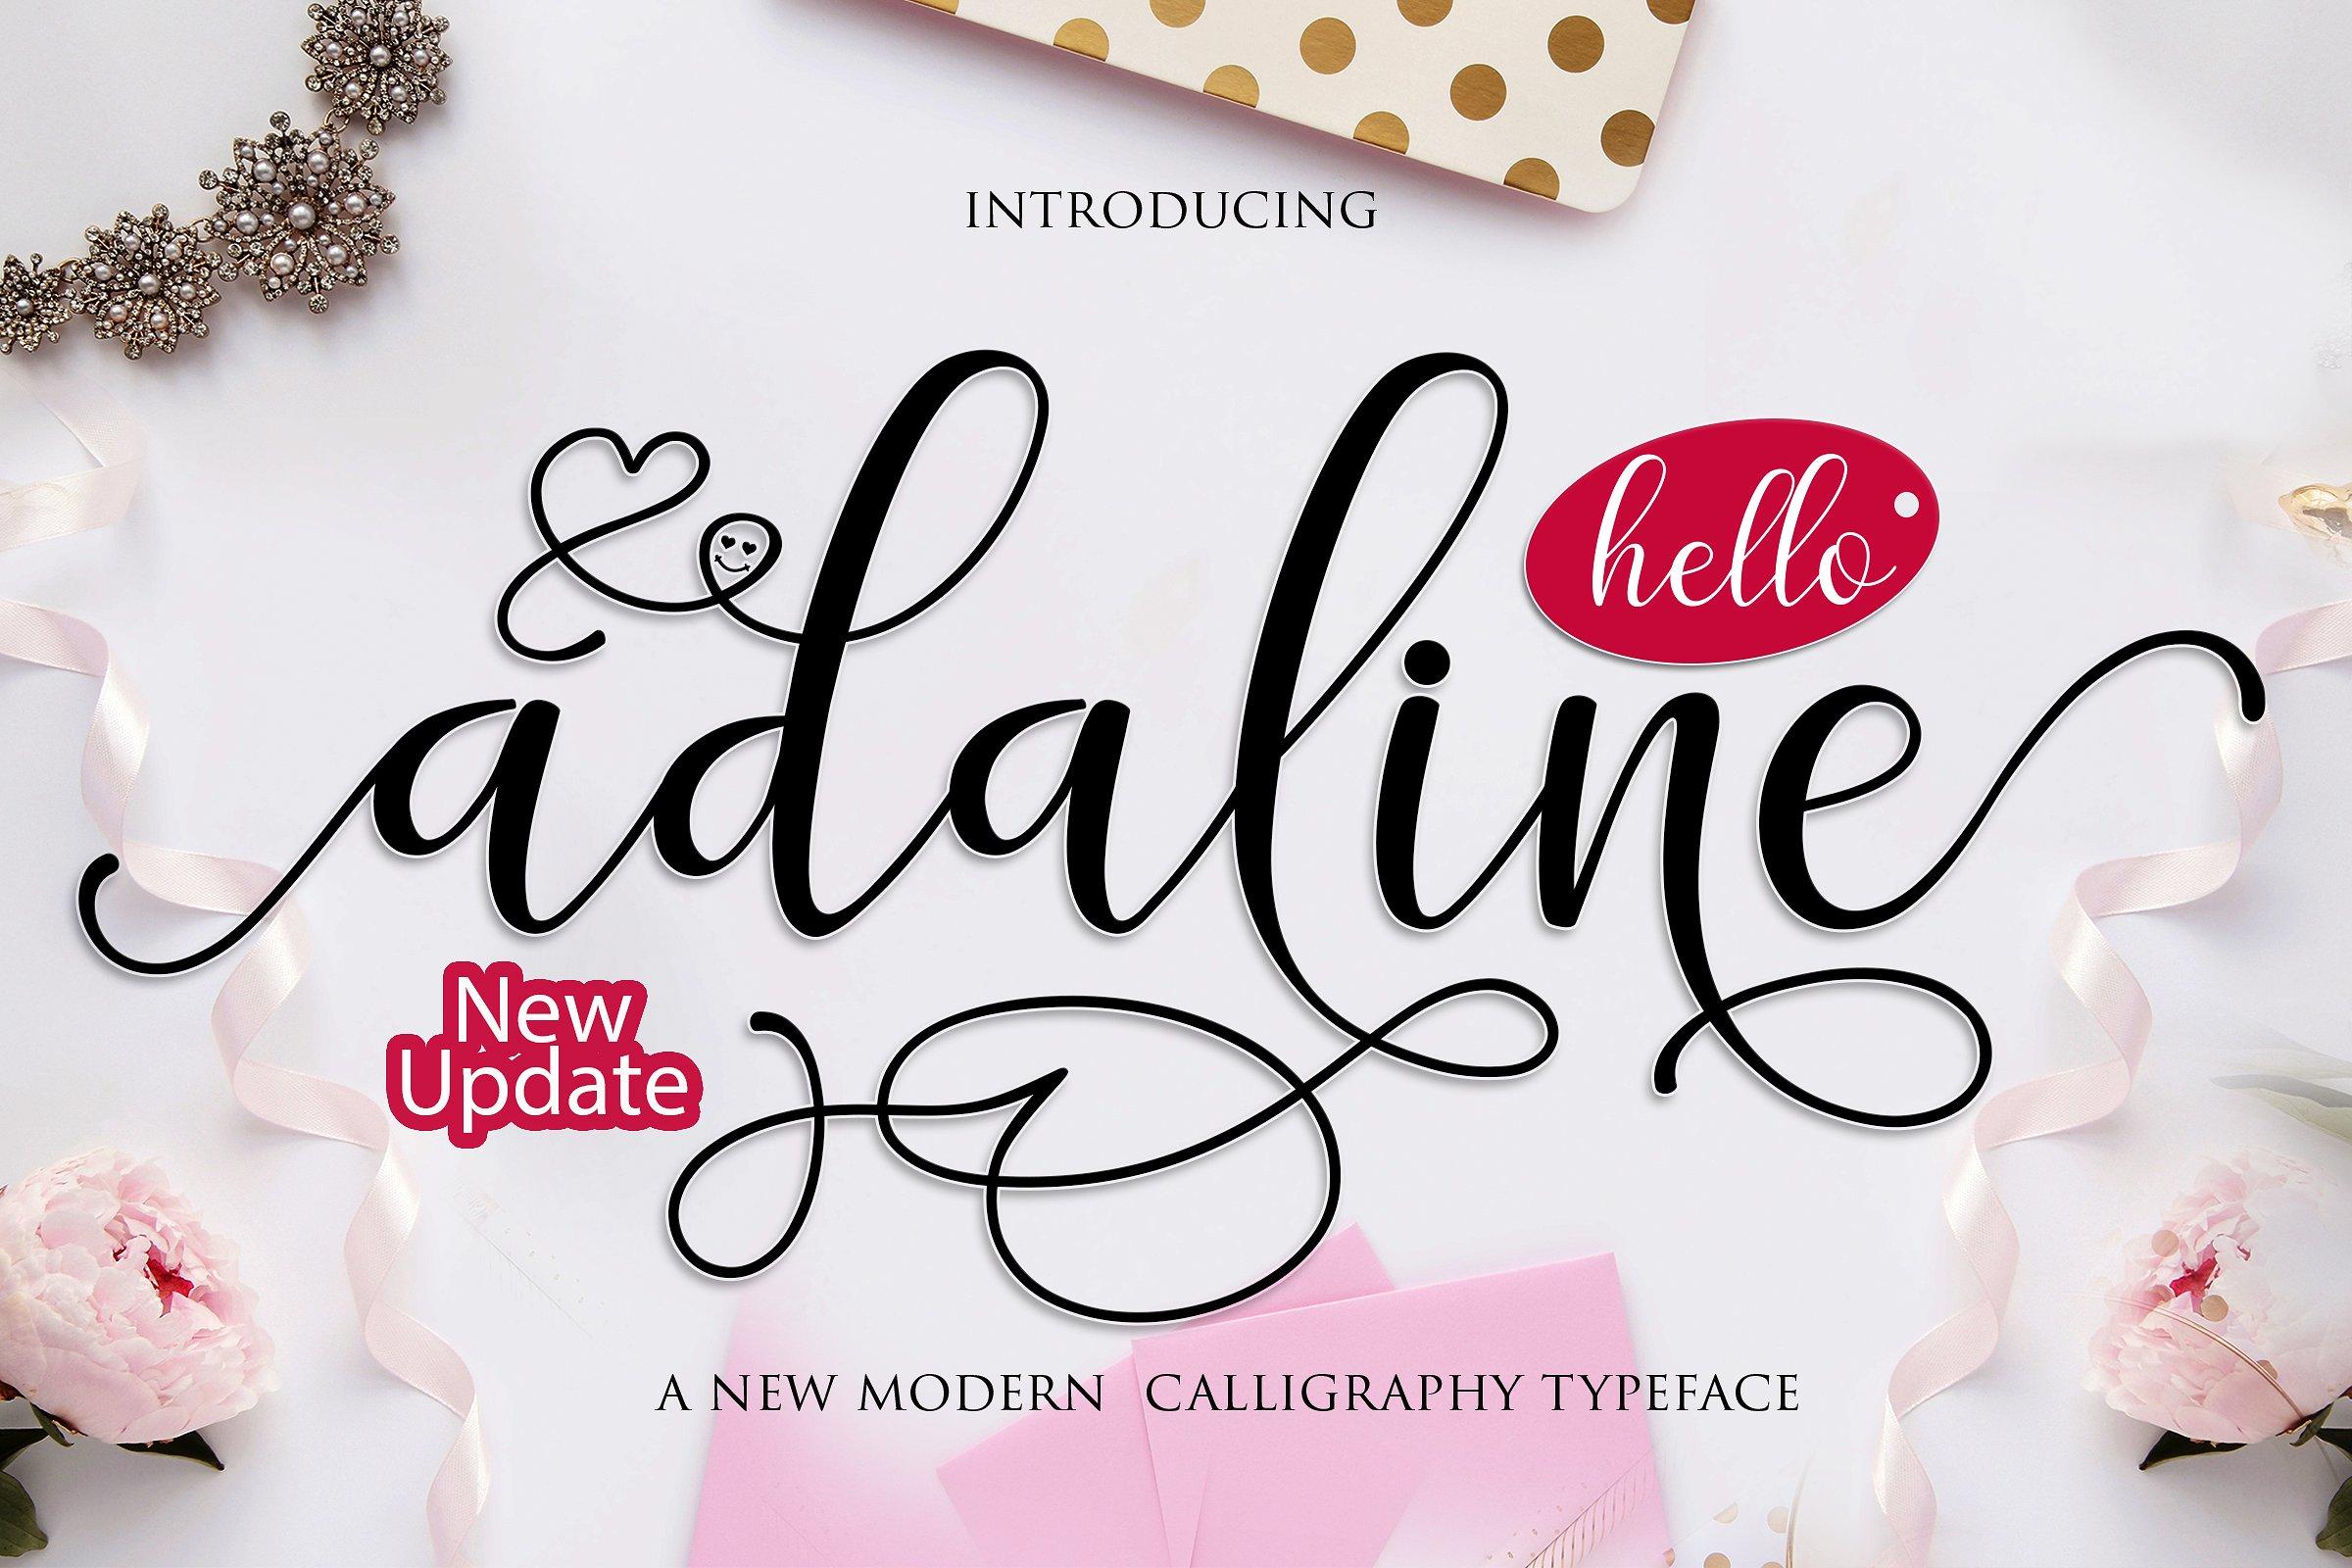 Adaline Calligraphy